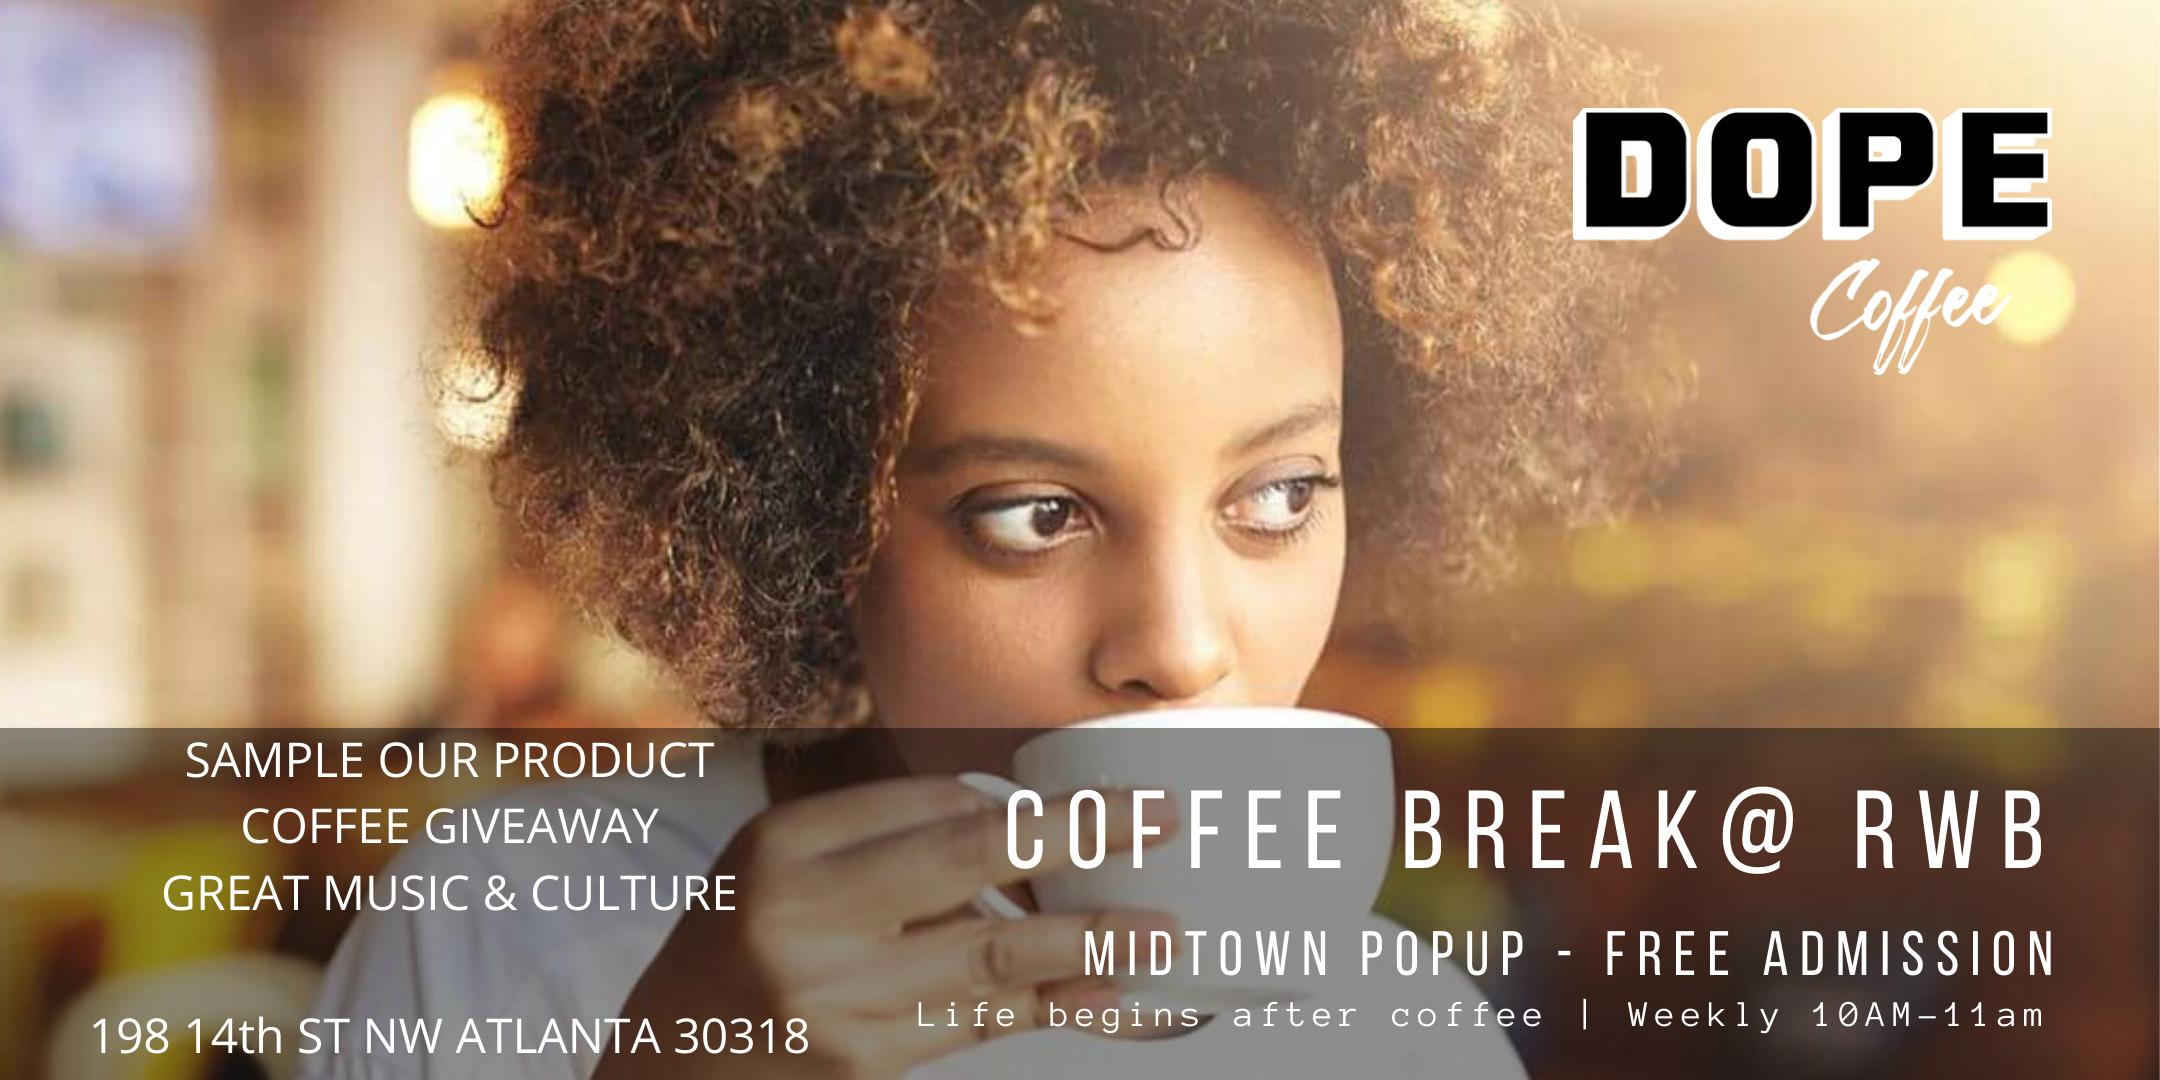 Dope Coffee Break @ Team RWB